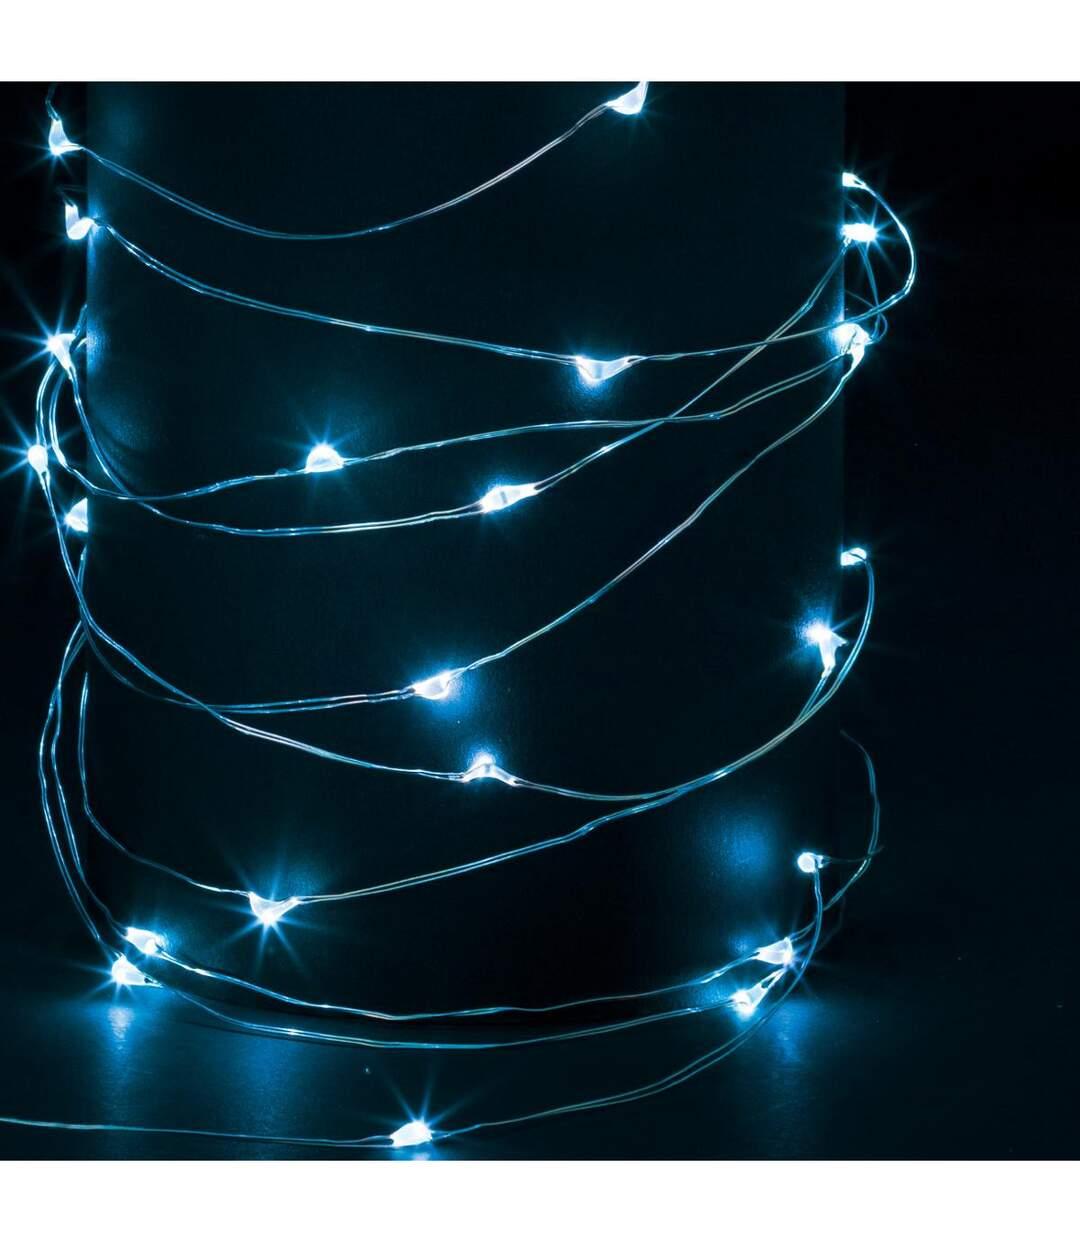 Feeric Christmas - Guirlande Lumineuse Intérieure et Extérieure 20 m 200 MicroLED Bleu lumière fixe